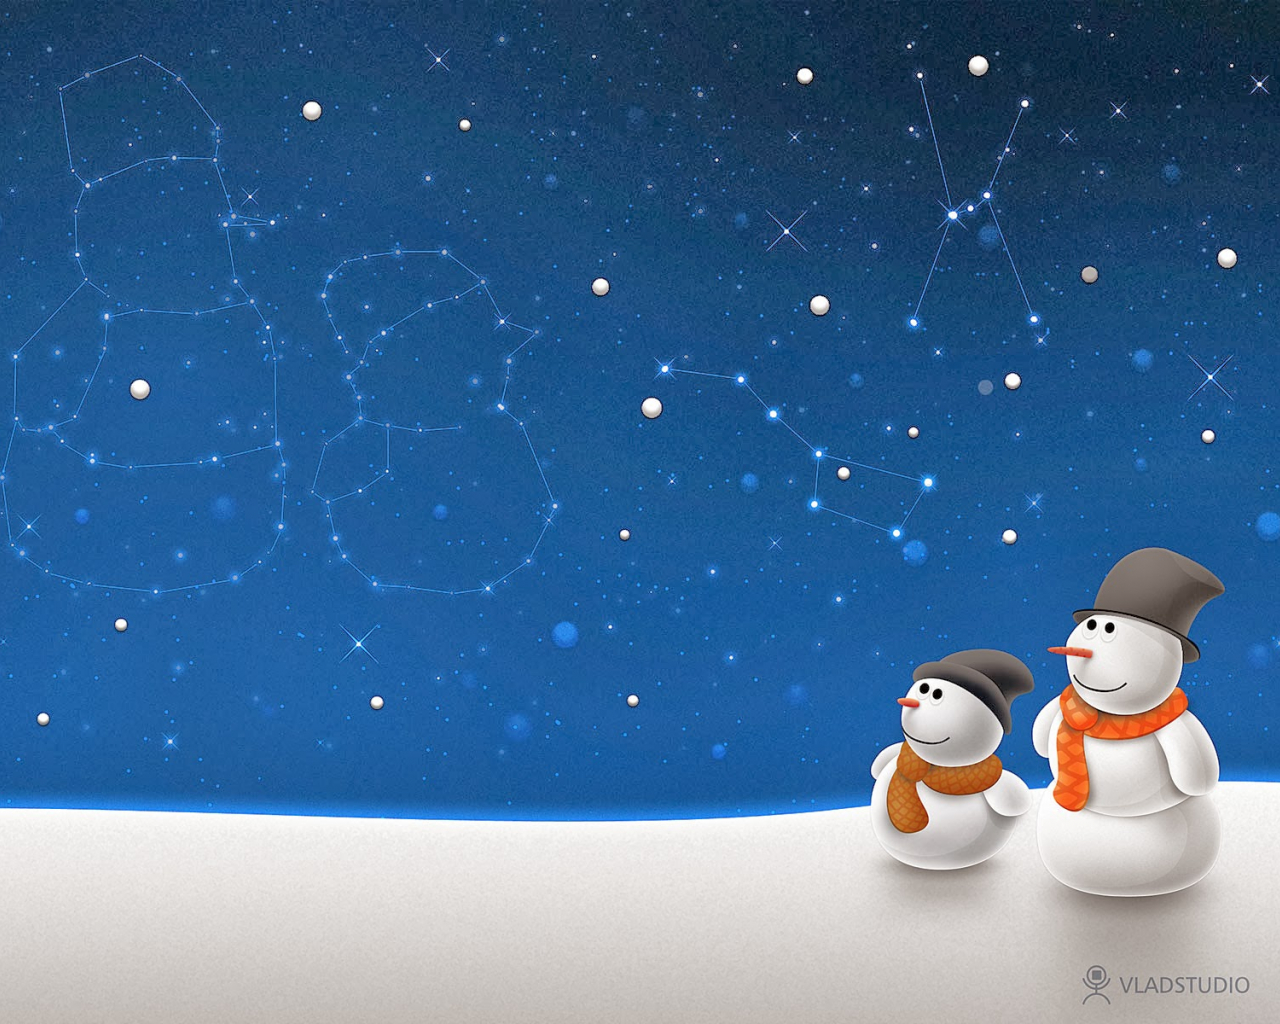 Free Download Sfondi Natalizi Per Tablet Android Christmas